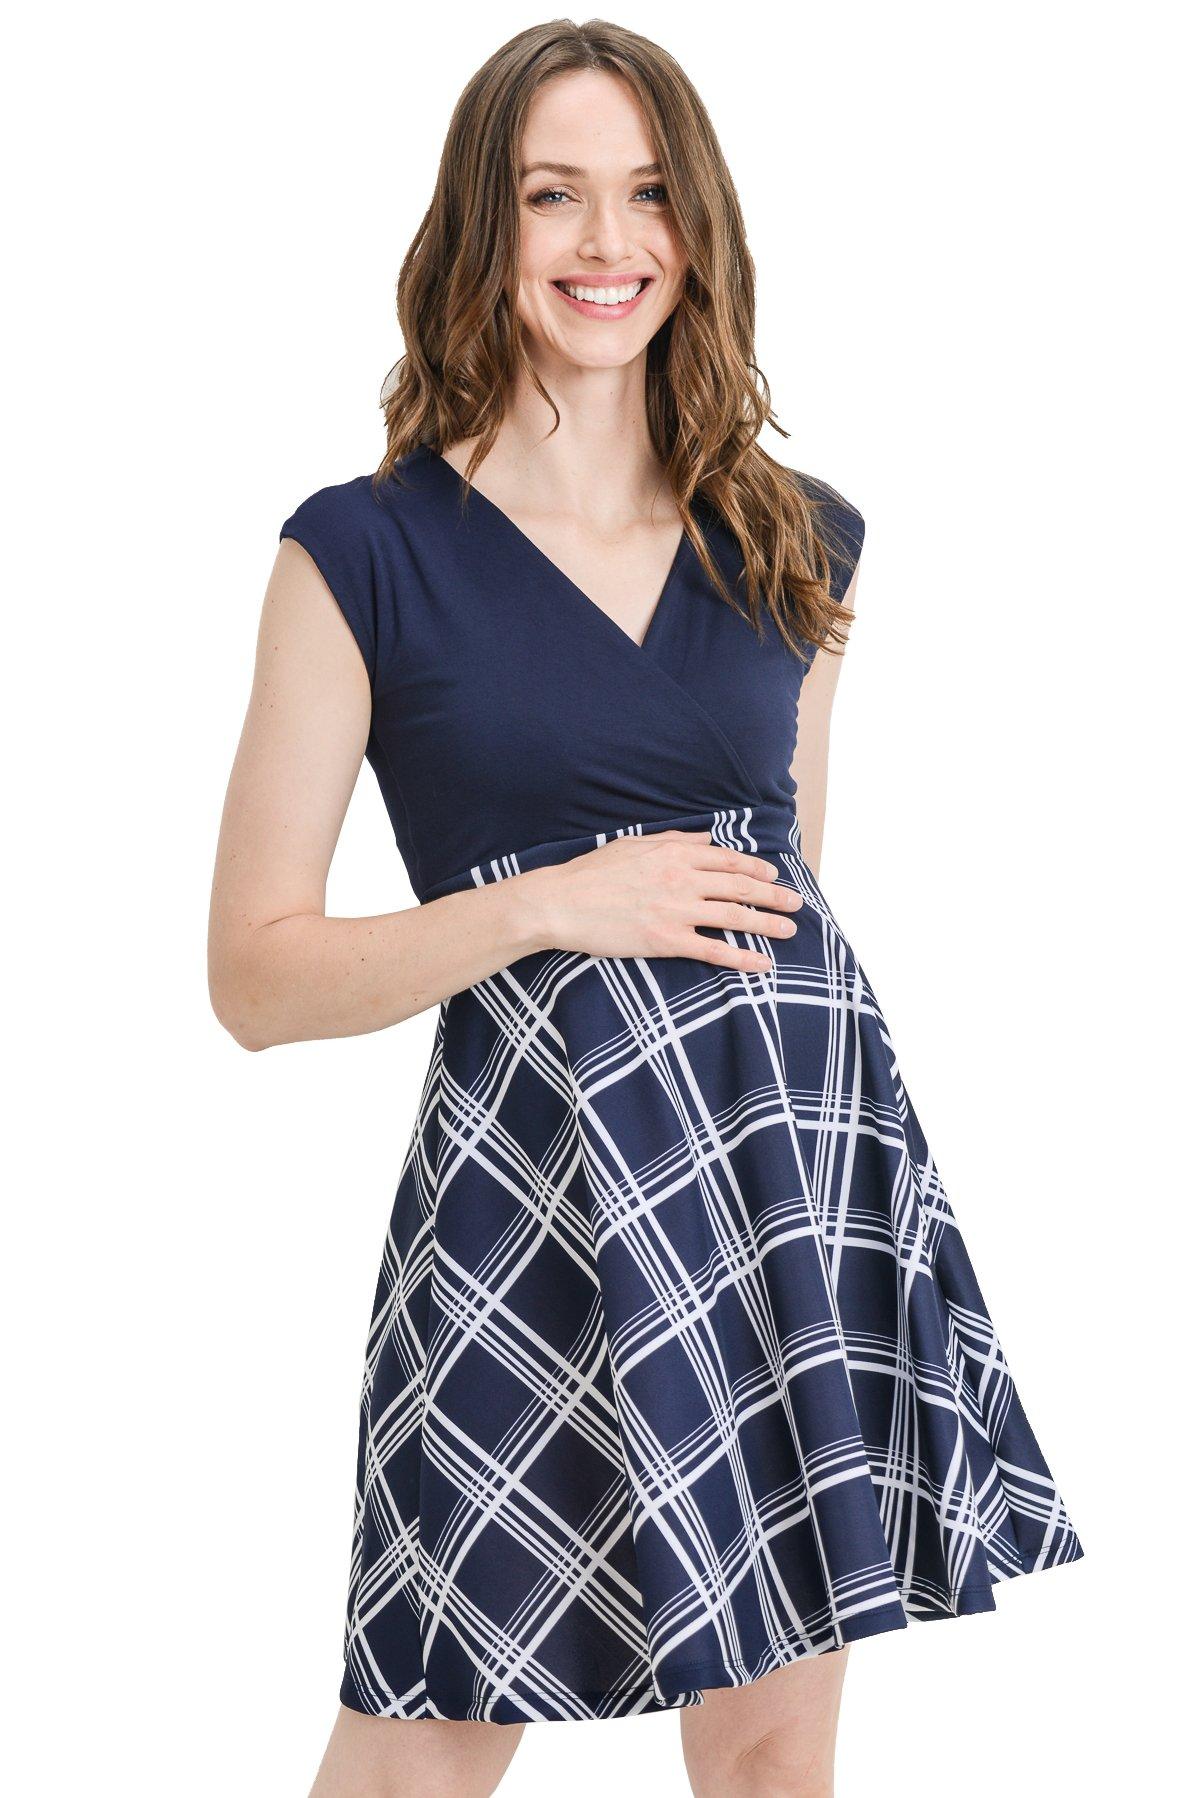 LaClef Women's Surplice Skater Nursing Friendly Maternity Dress (X-Large, Navy/White Stripe)